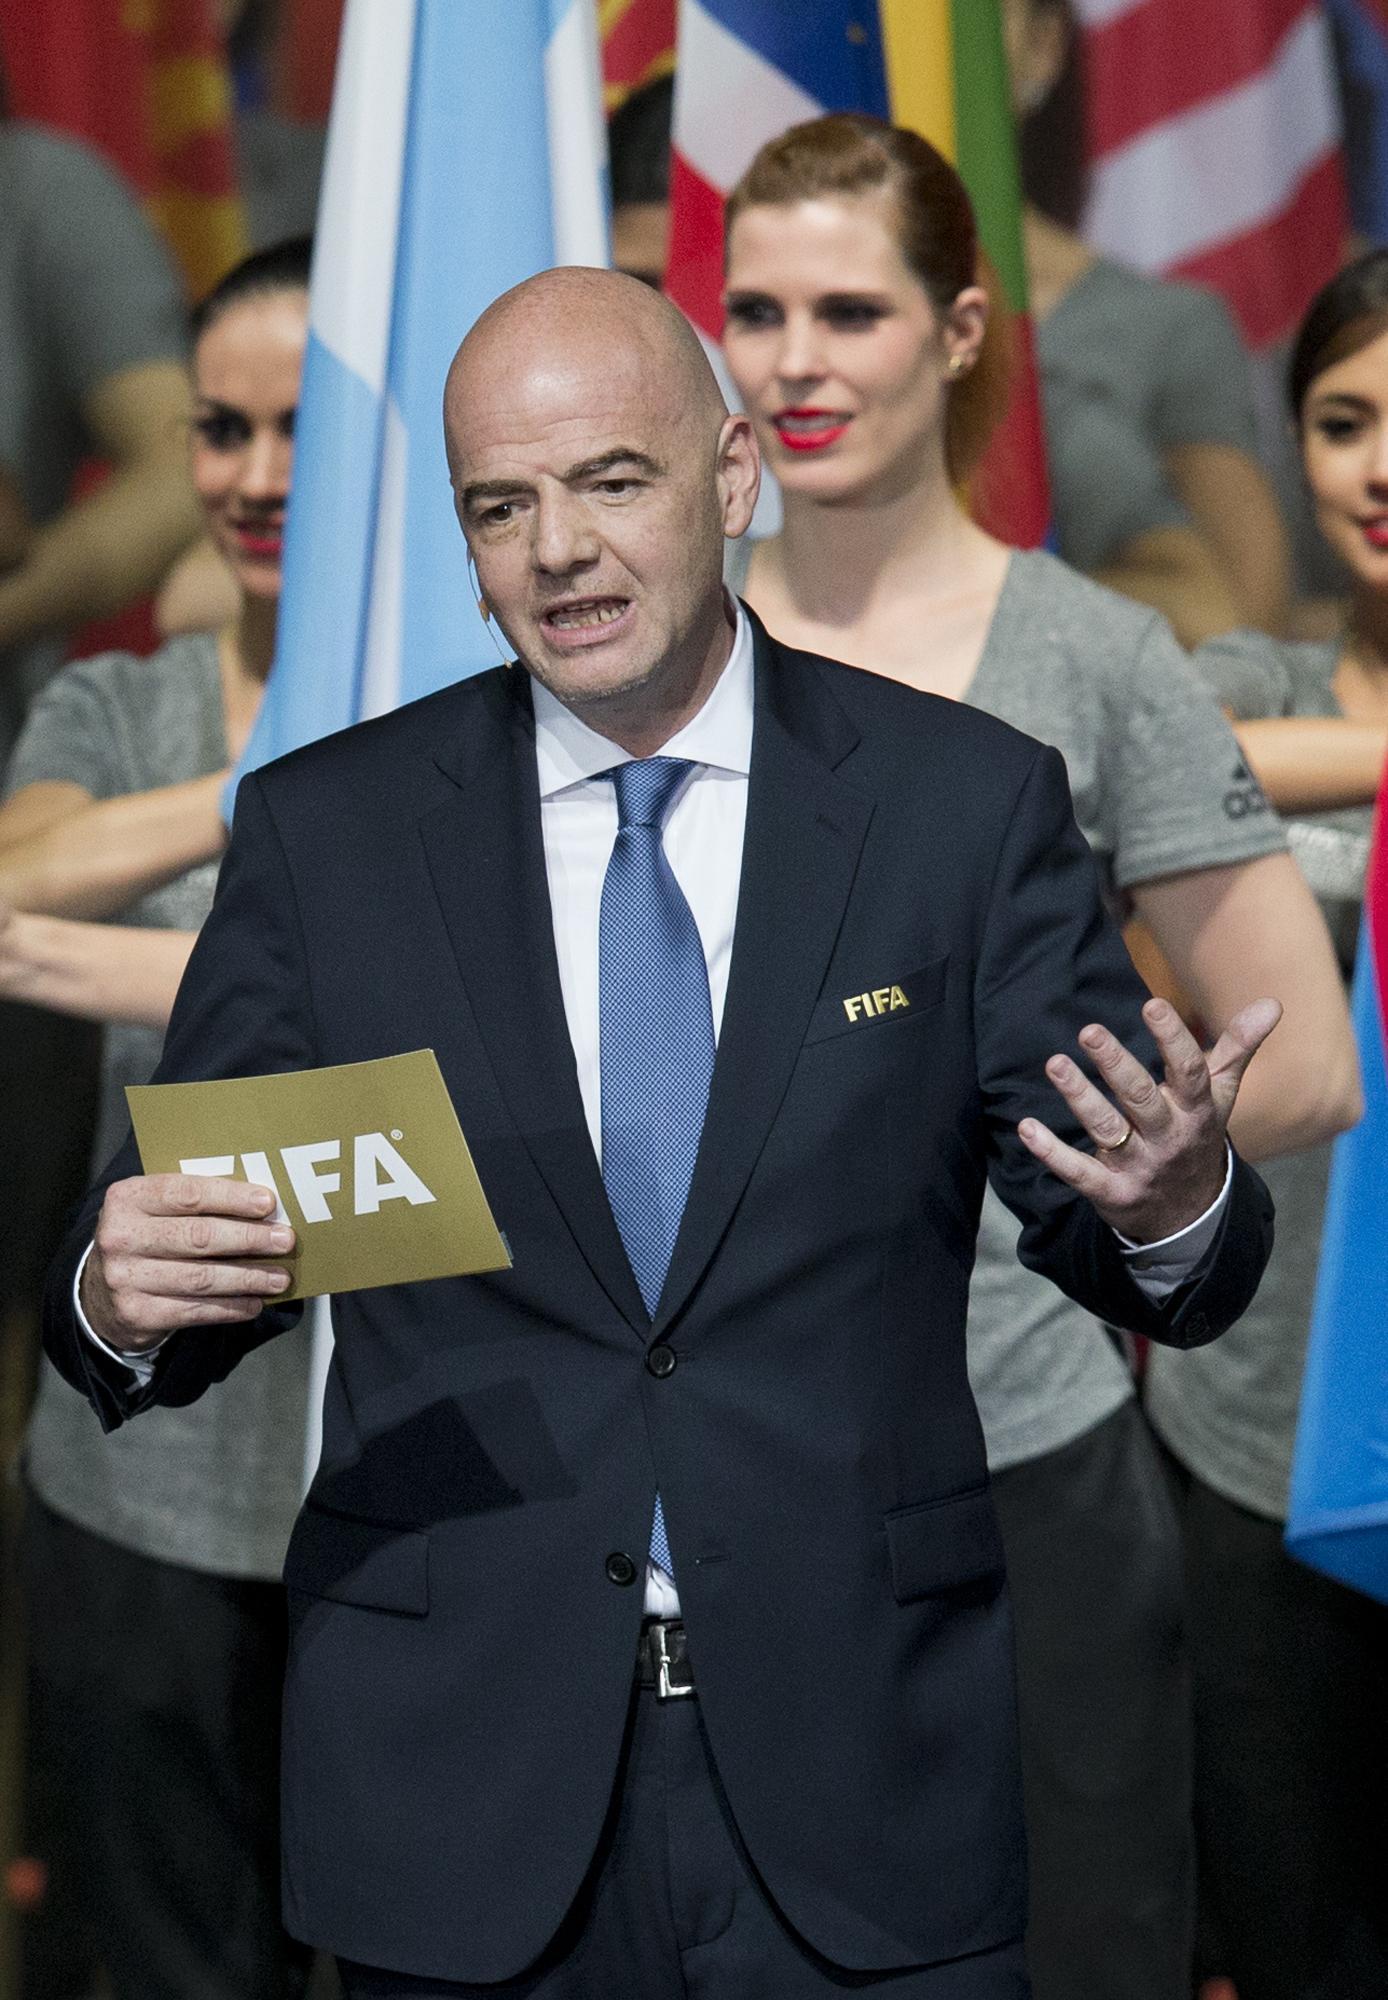 Kosovo, Gibraltar join FIFA before 2018 World Cup qualifying - Washington Times